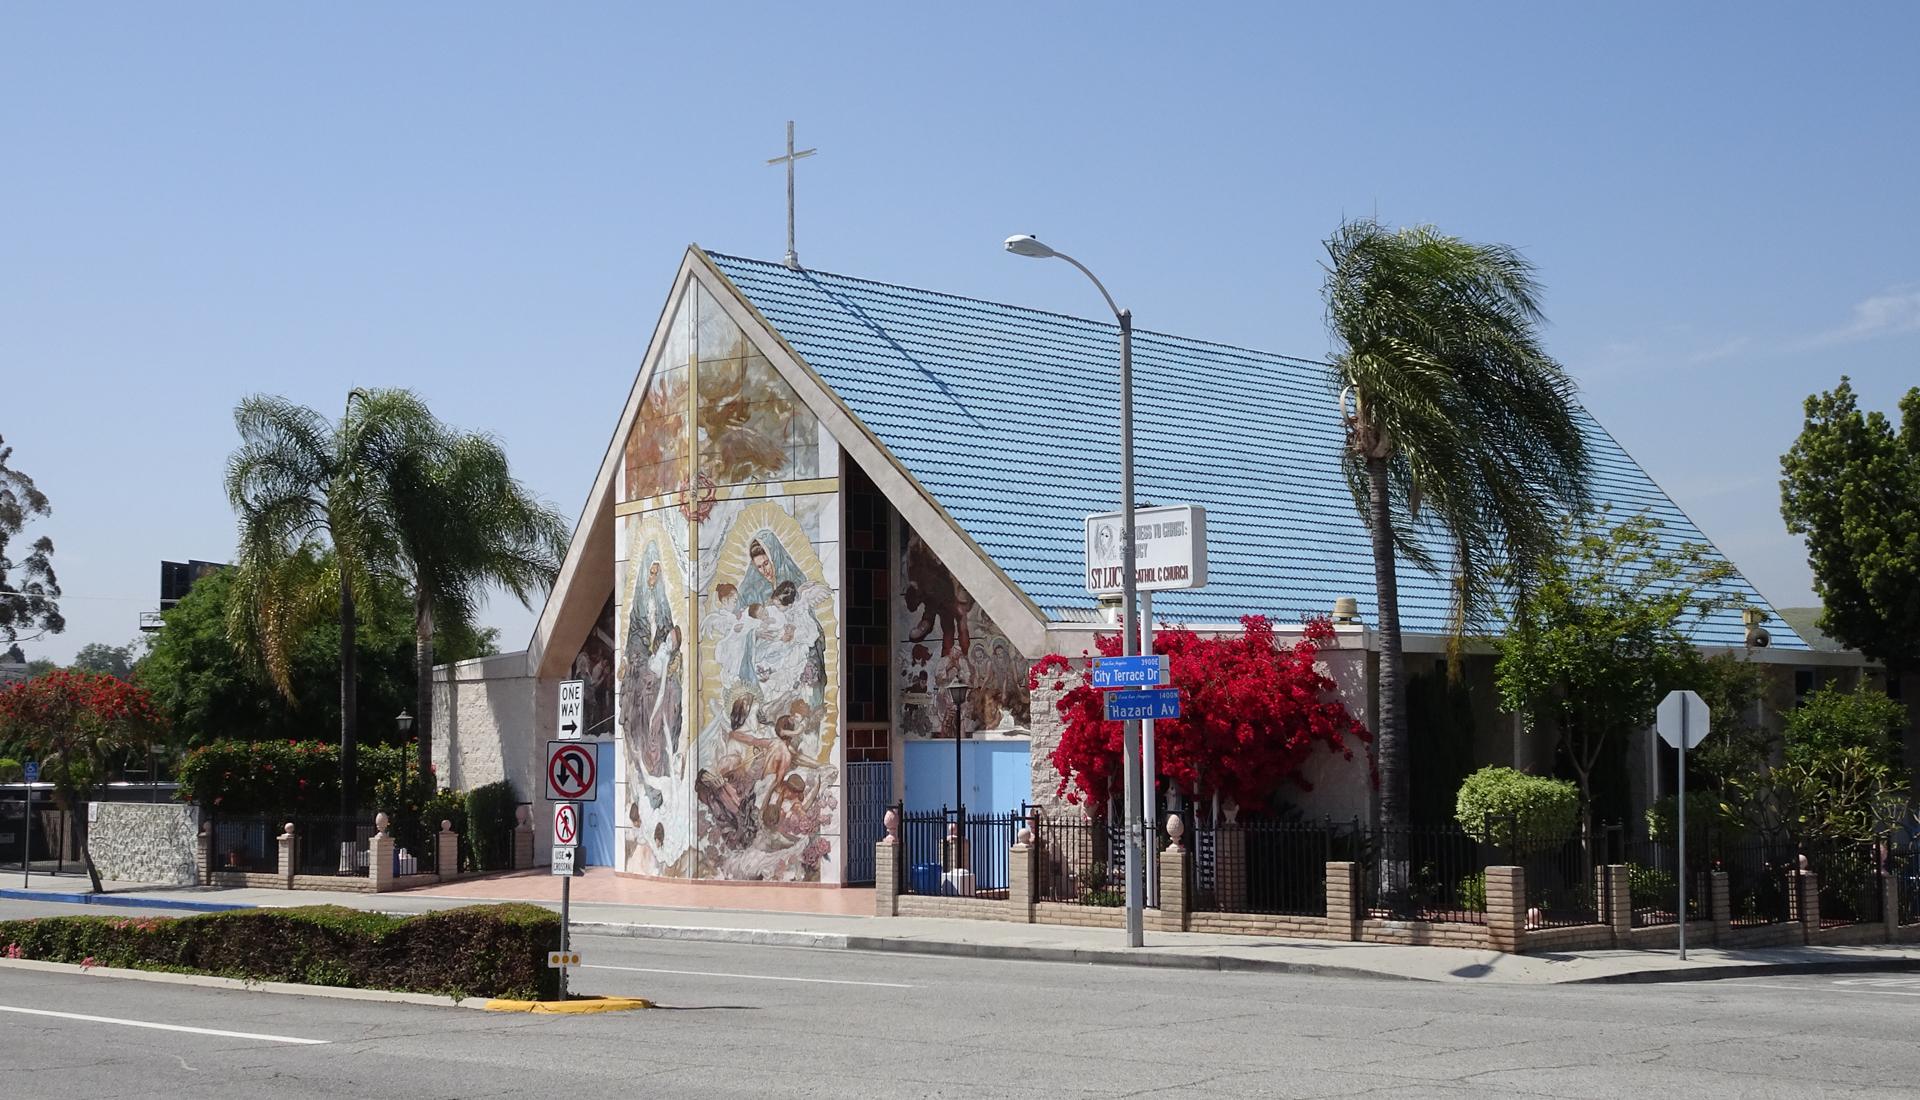 St Lucy's Catholic Church